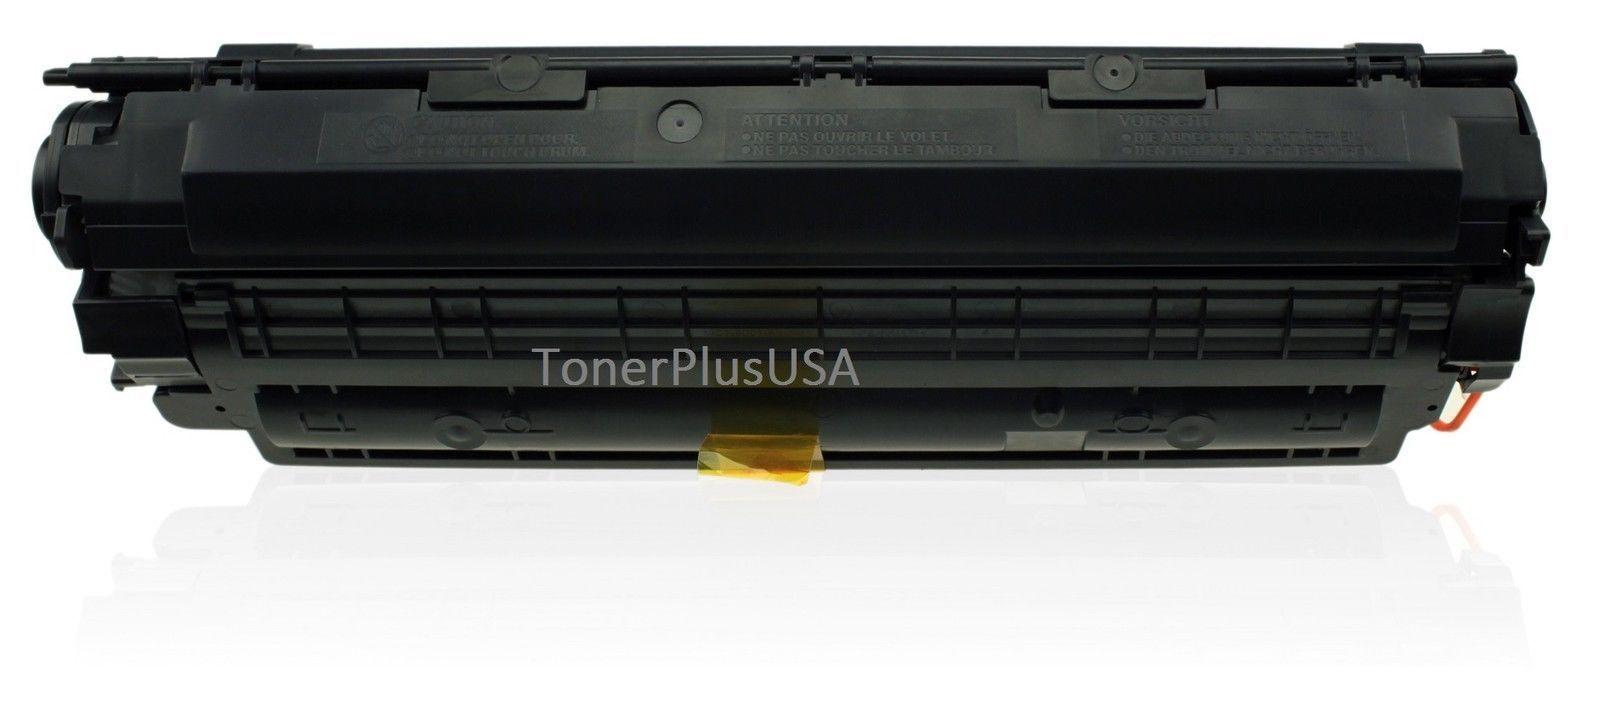 1pk Cf283a 83A Toner Cartridge For Hp Laserjet Pro M125rnw M125nw M127fn Mfp